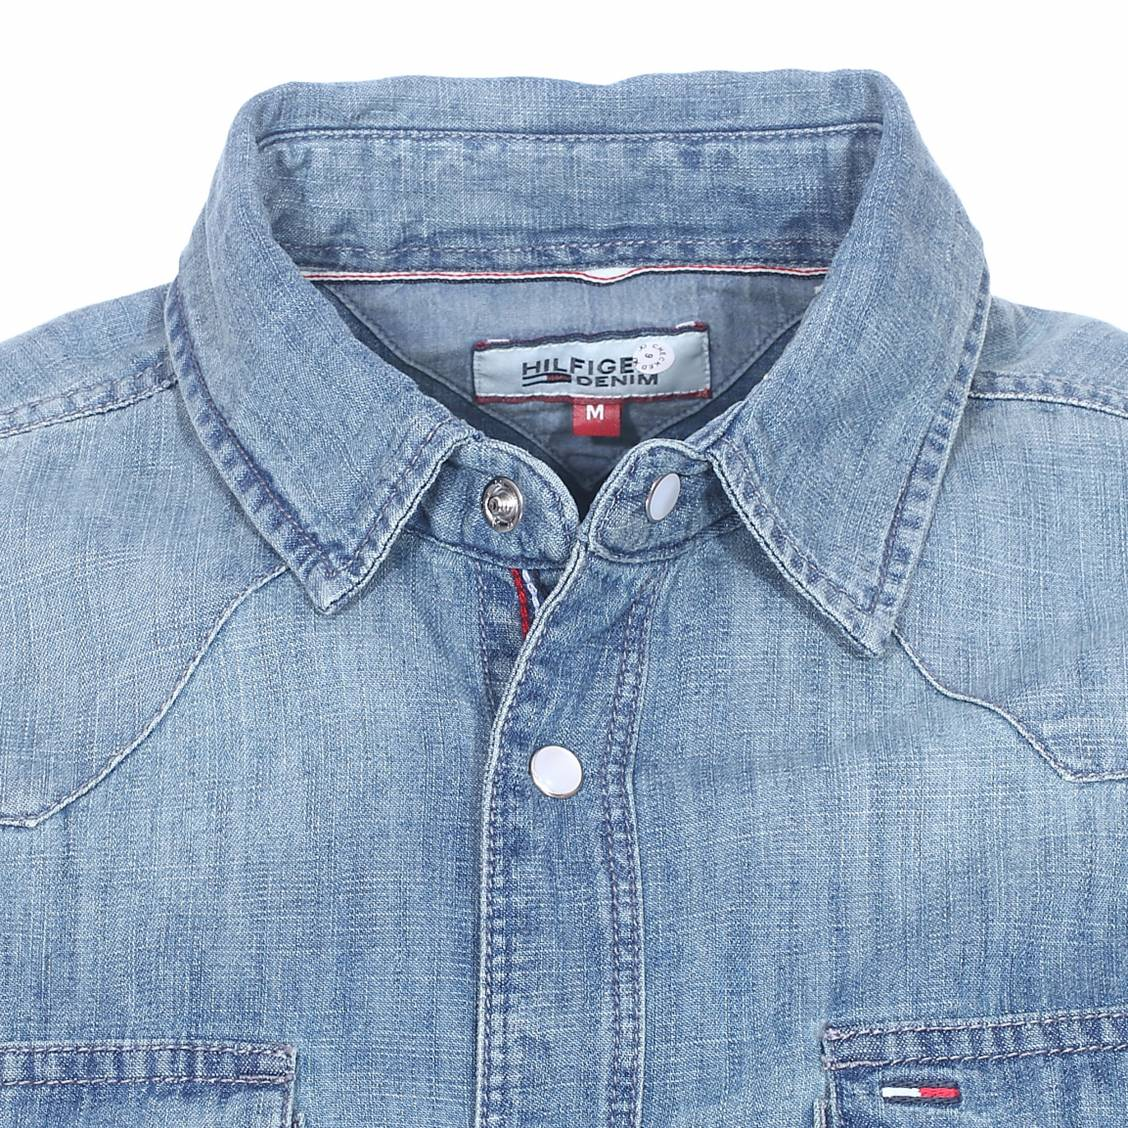 chemise en jean hilfiger denim poches poitrine rue des hommes. Black Bedroom Furniture Sets. Home Design Ideas